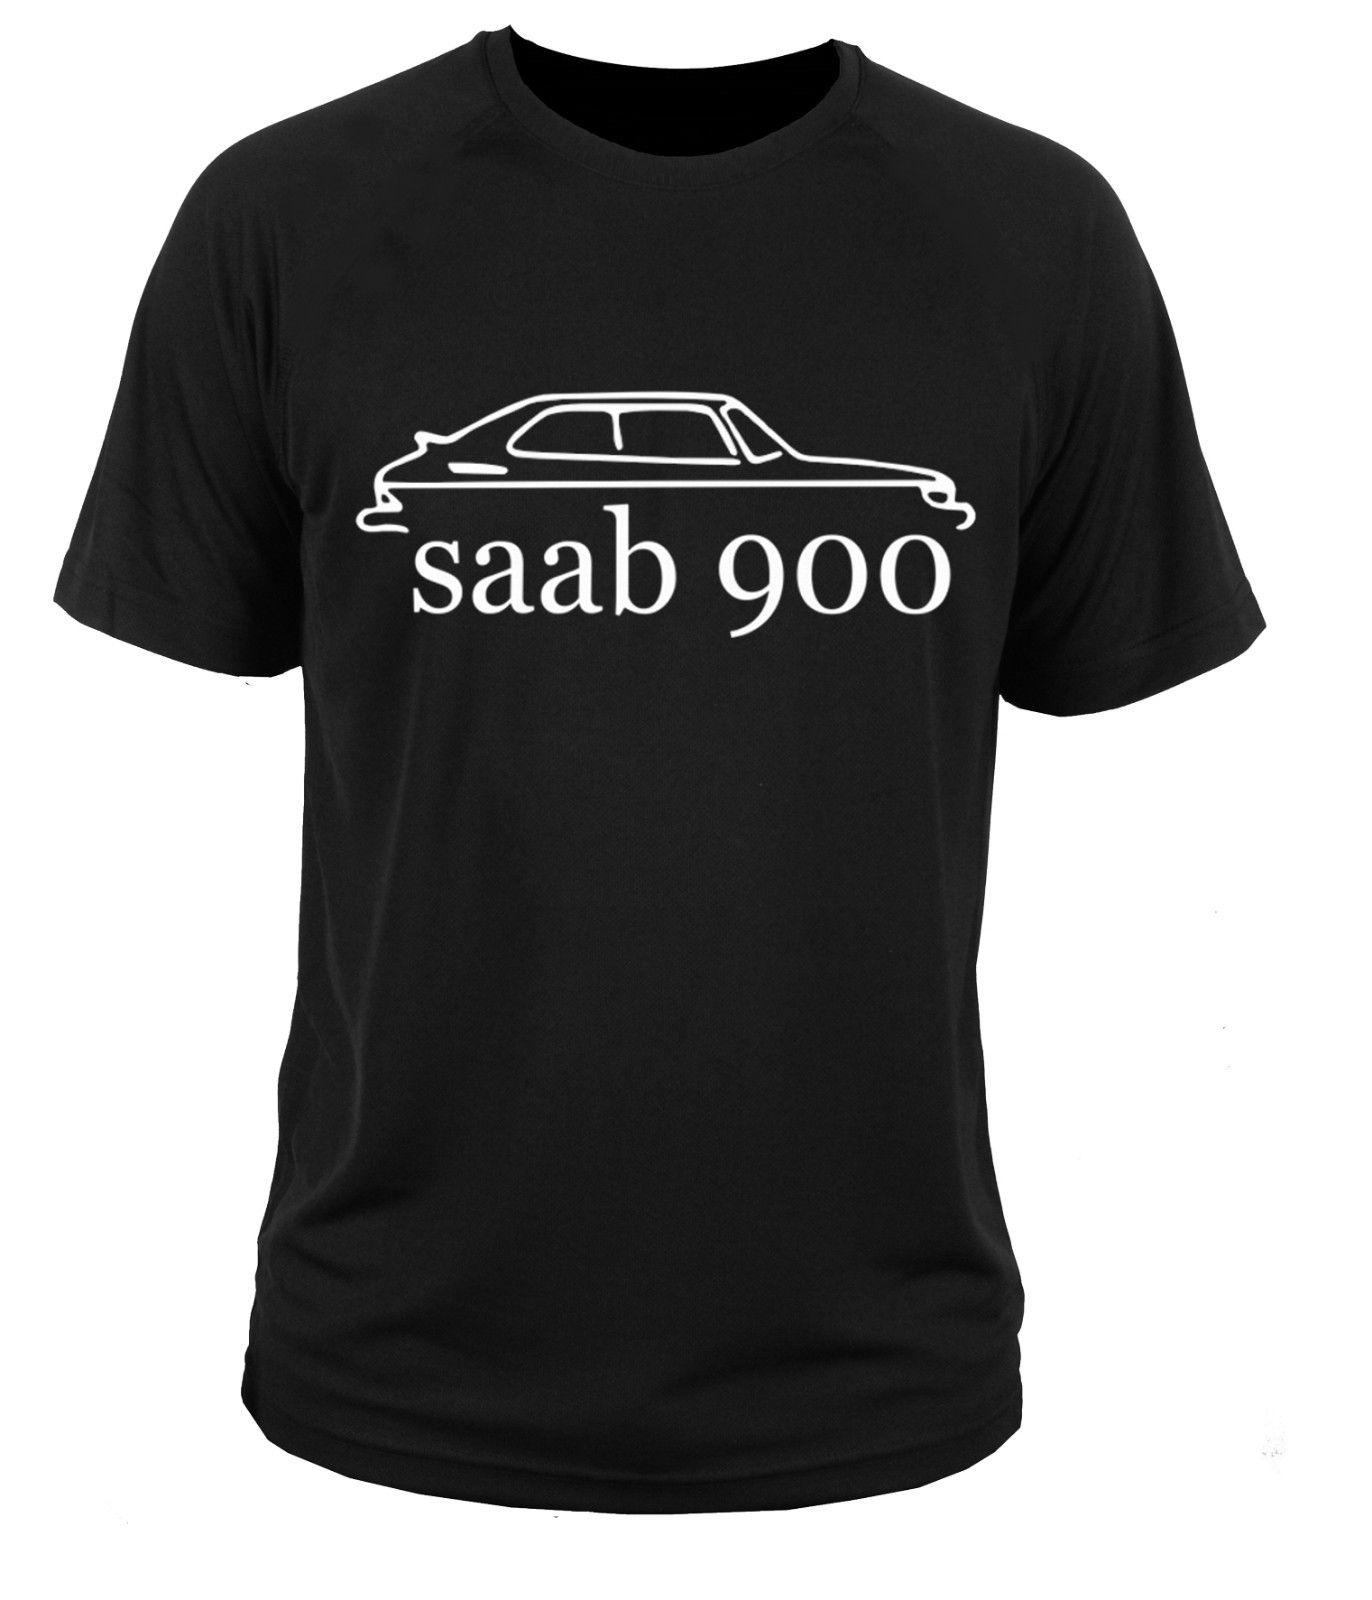 T shirt t-shirt Saab 900  turbo aero 9-5 9-3